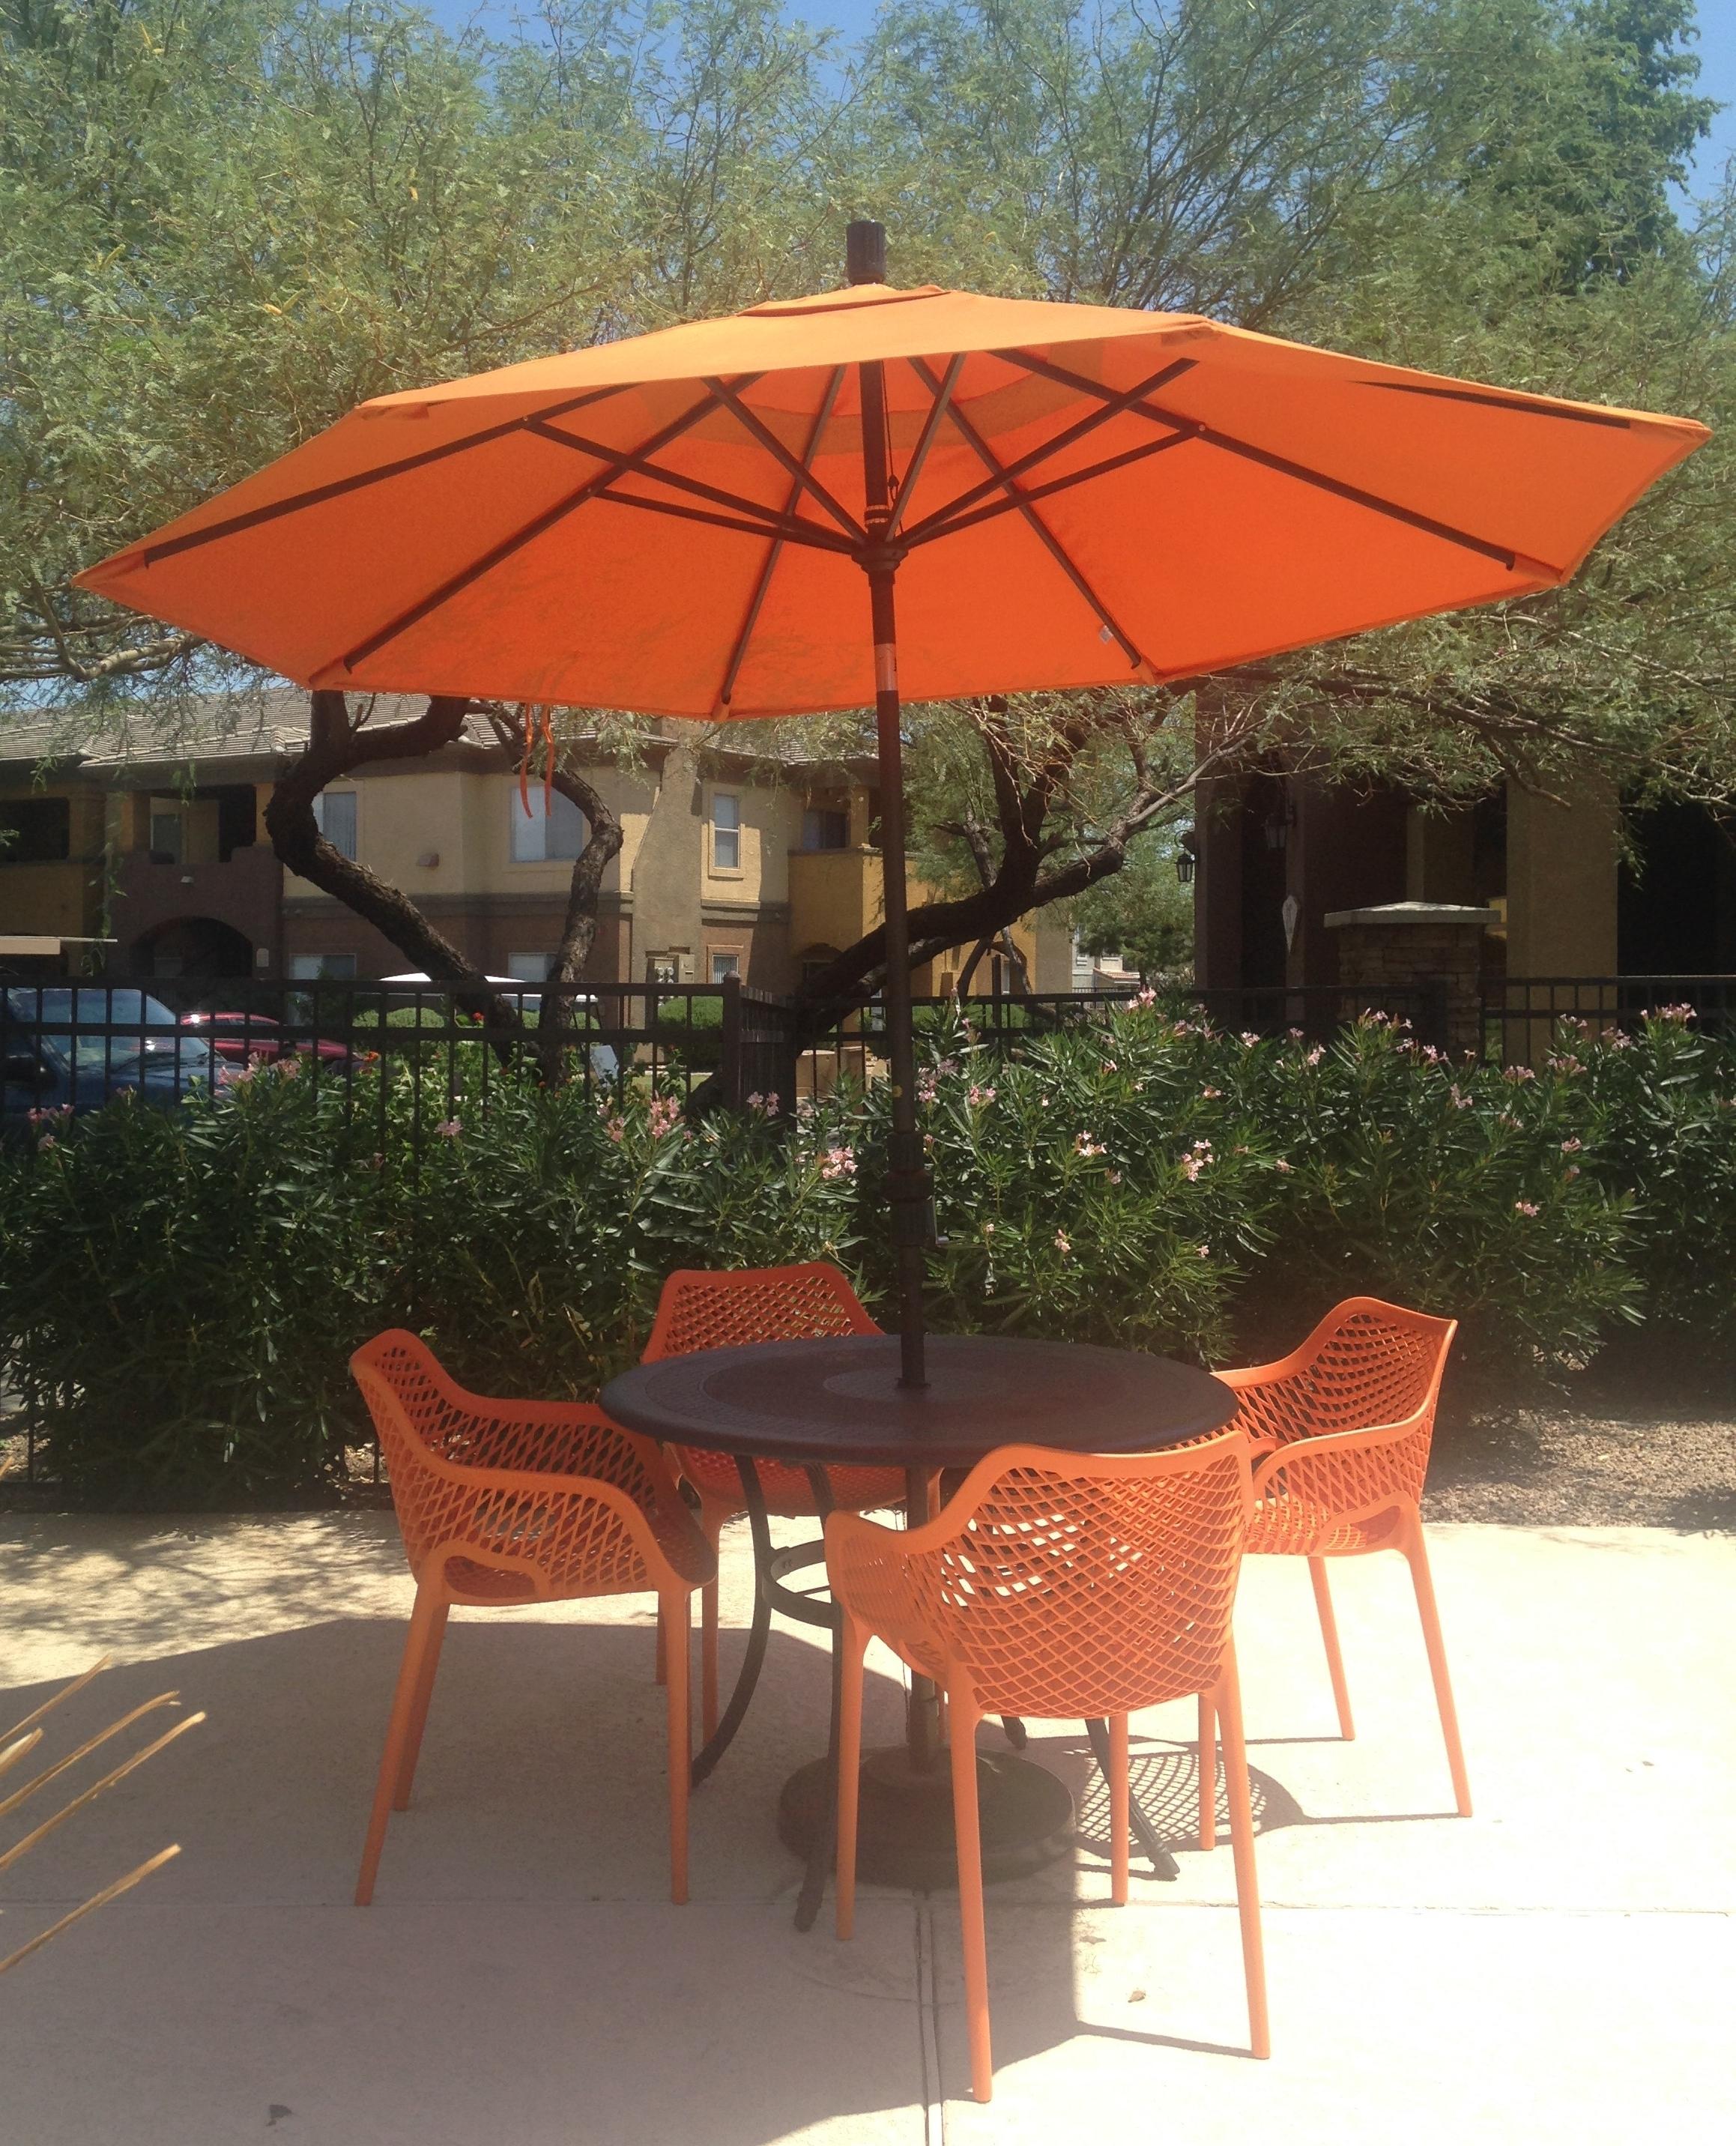 Most Recent Photo Of Target Patio Umbrella Exterior Orange Target Patio With Regard To Small Patio Umbrellas (View 7 of 20)